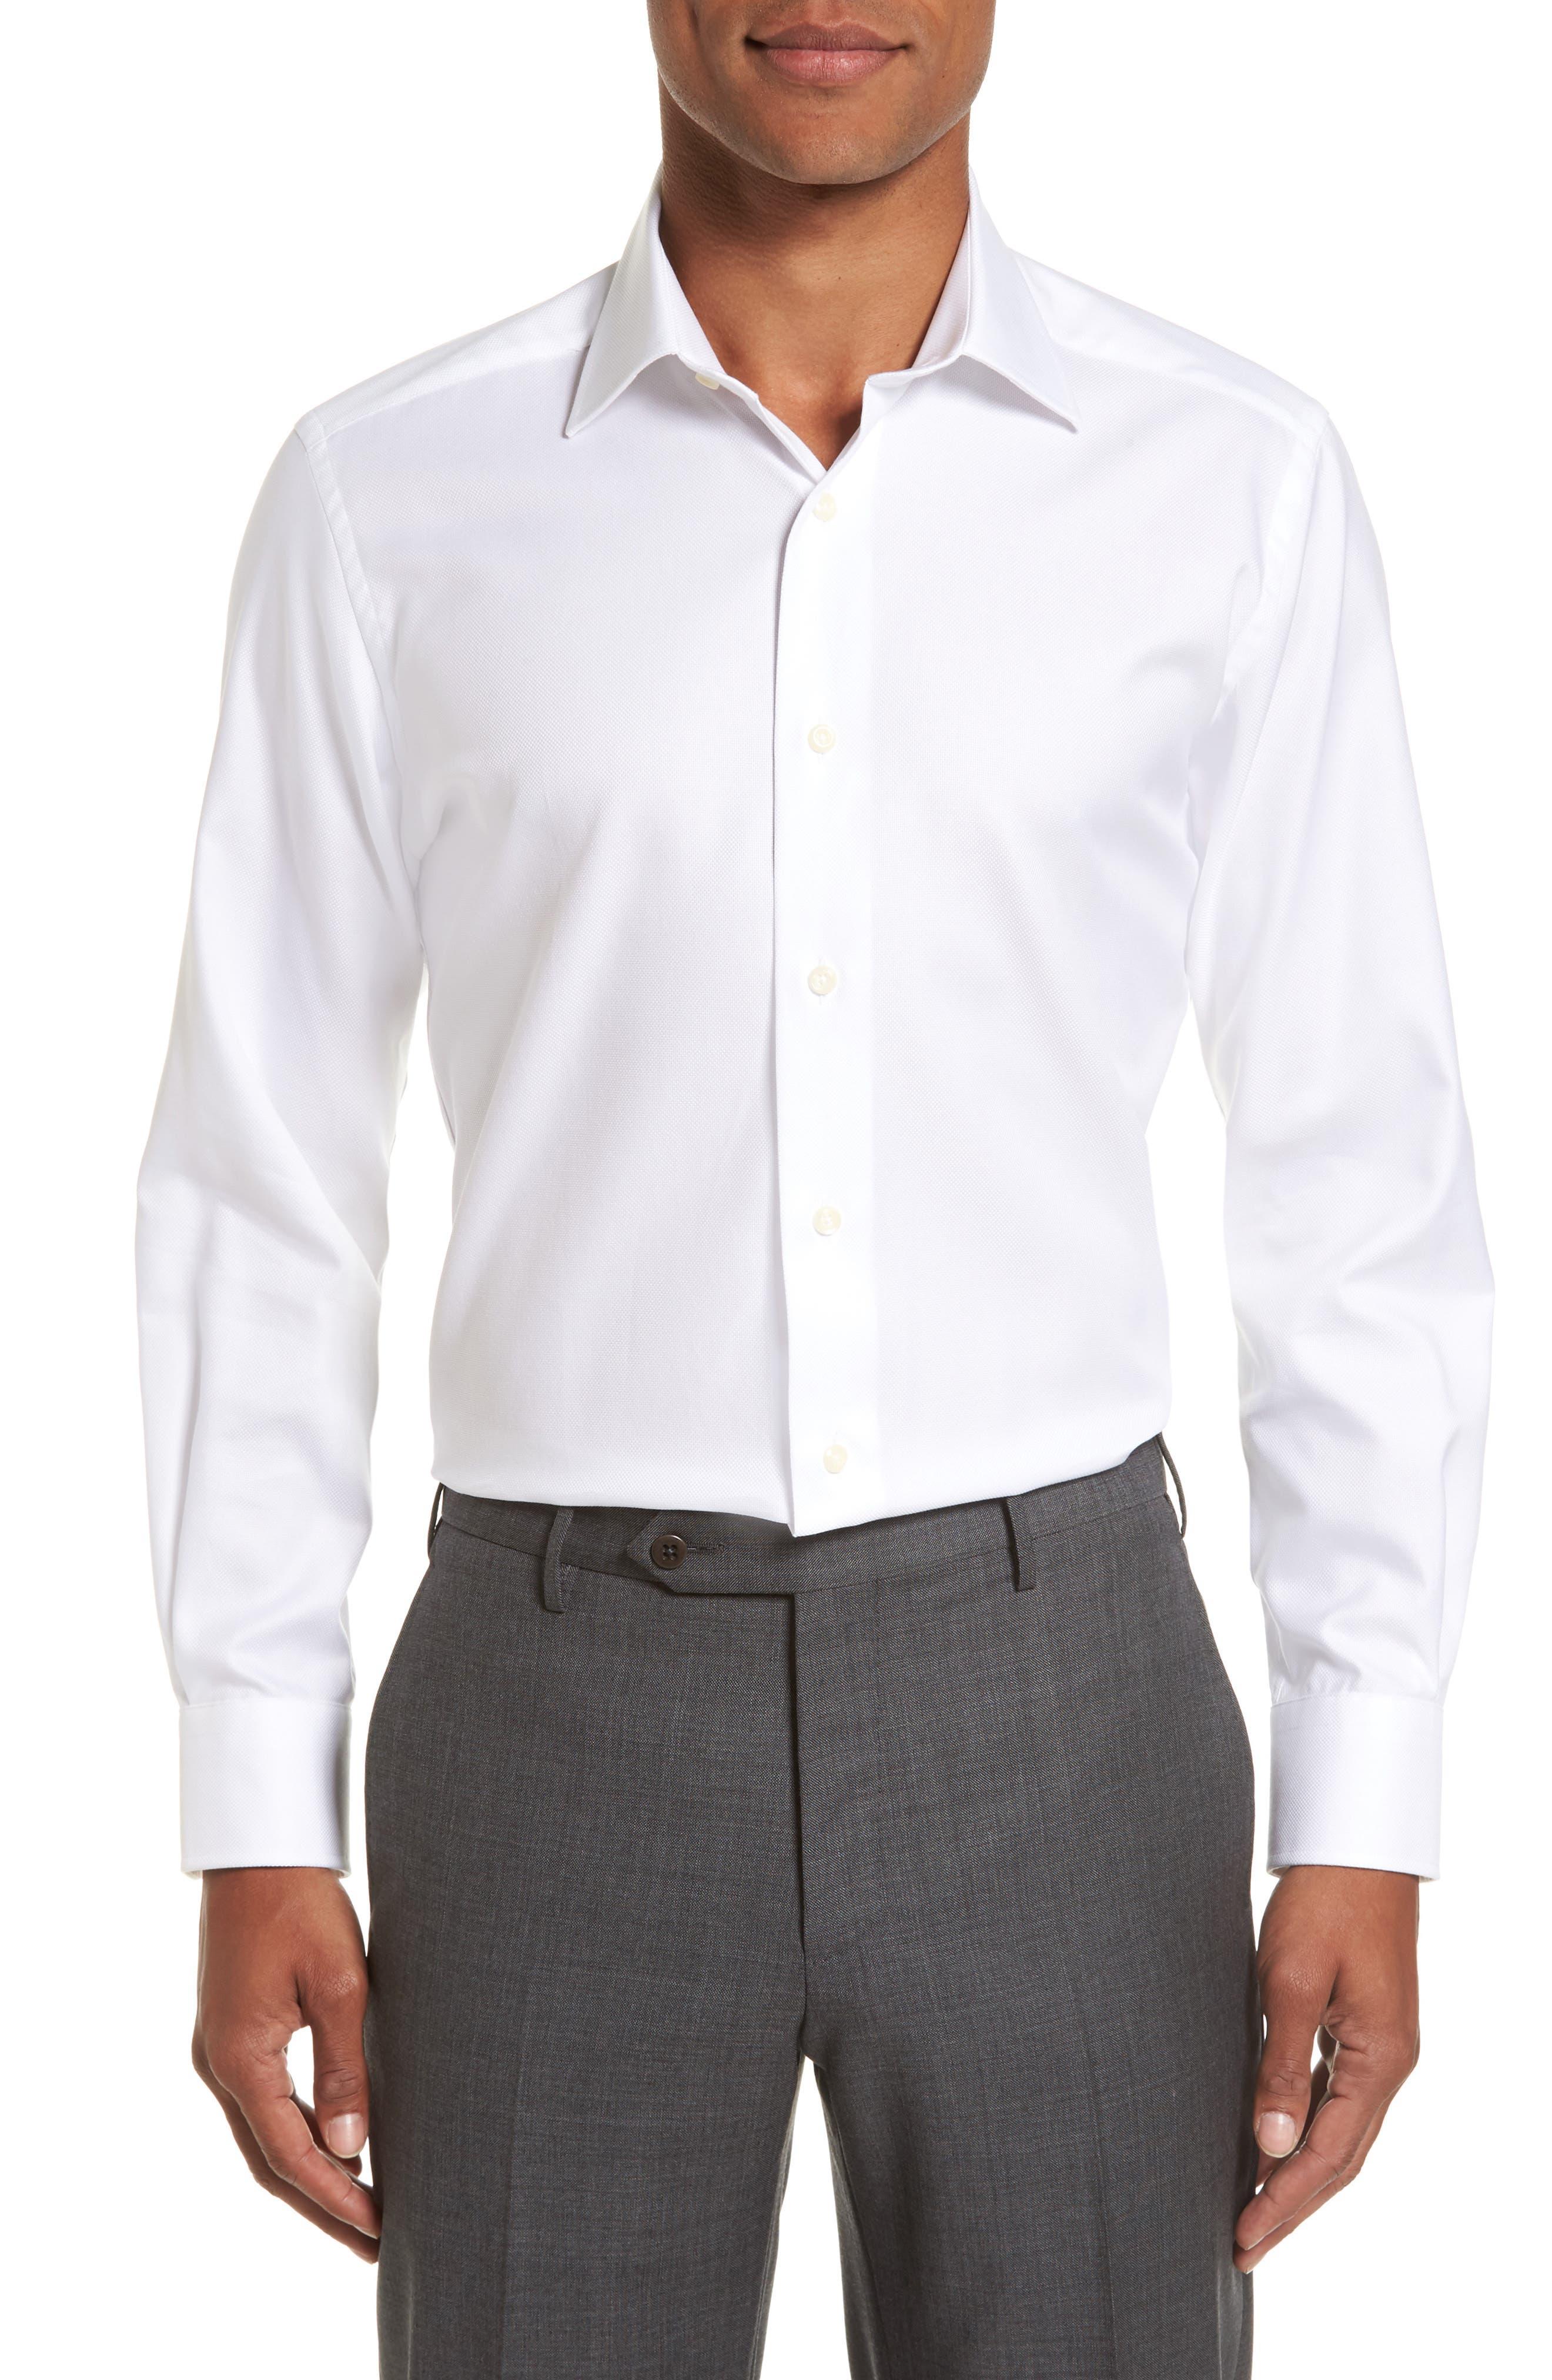 DAVID DONAHUE, Trim Fit Dress Shirt, Main thumbnail 1, color, WHITE